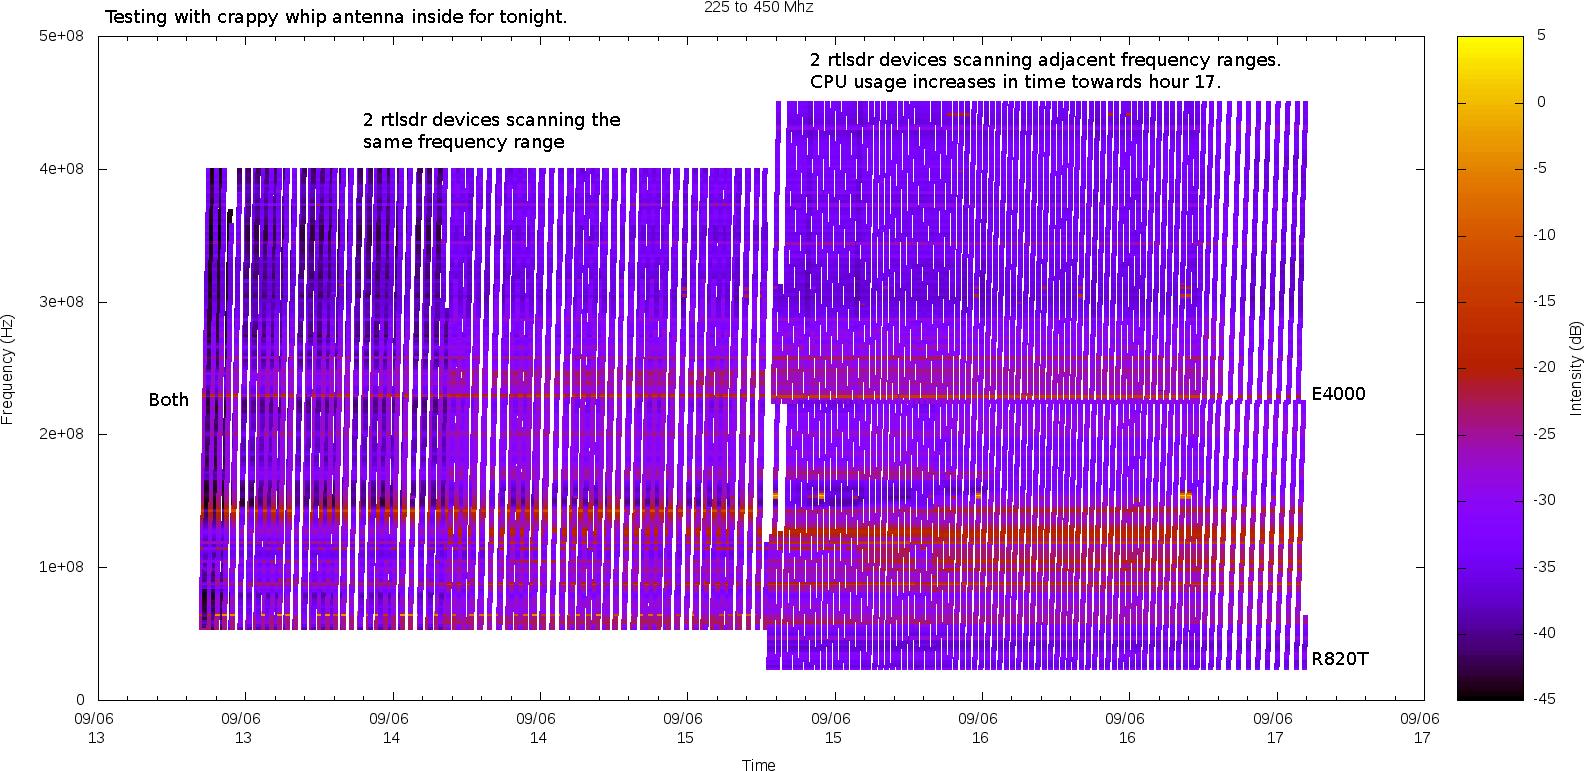 rtl-sdr and GNU Radio w/Realtek RTL2832U, E4000 and R820T